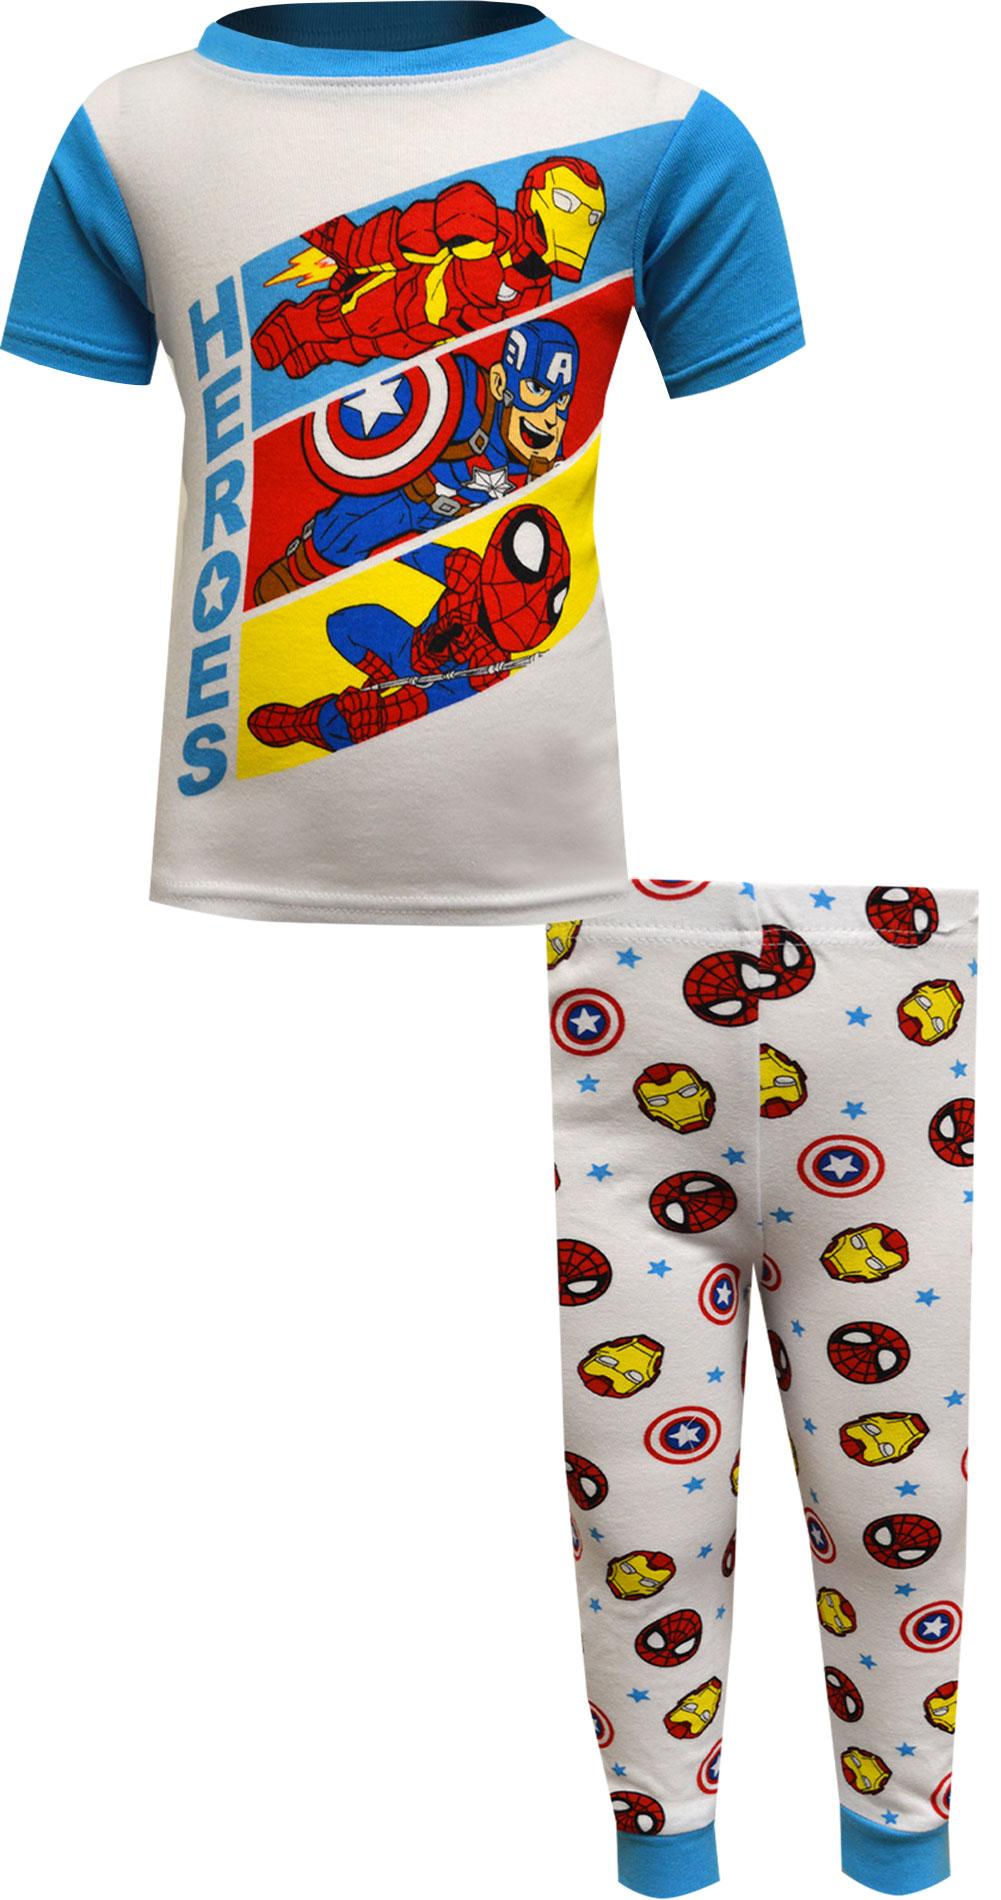 Image of Marvel Comics Avengers Cotton Toddler Pajamas for boys